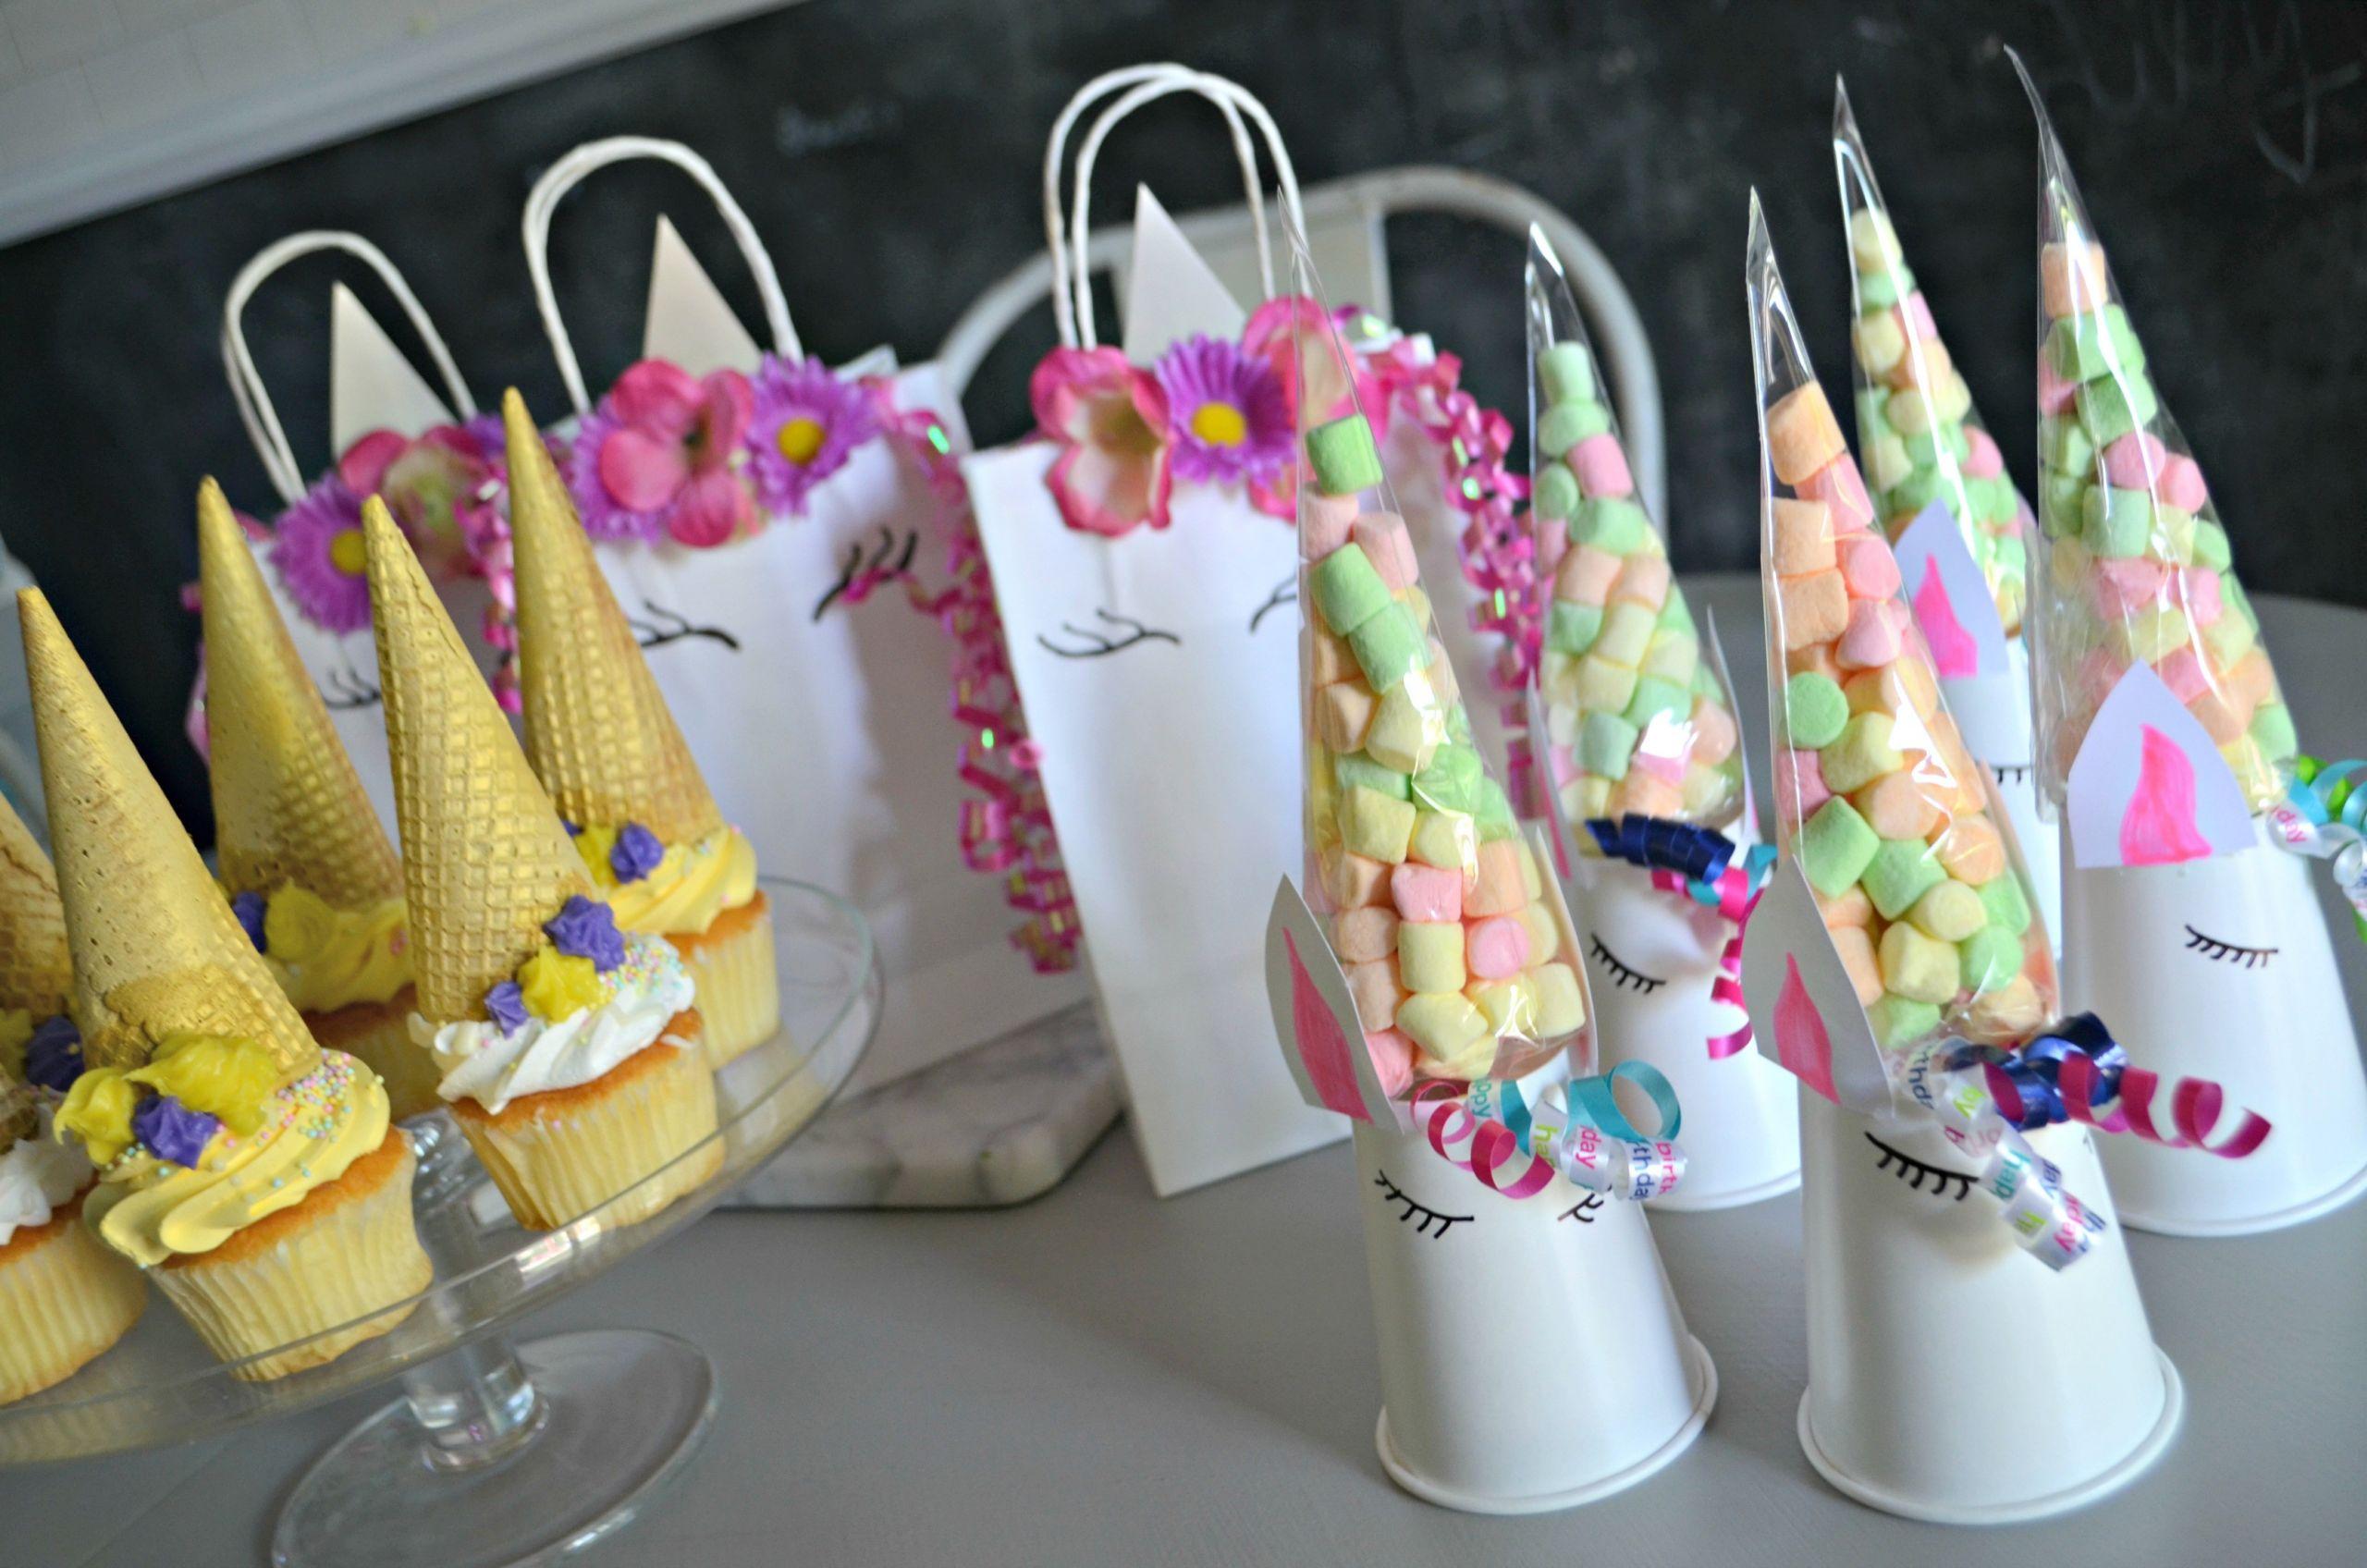 Unicorn Party Theme Food Ideas  Make These 3 Frugal Cute and Easy DIY Unicorn Birthday